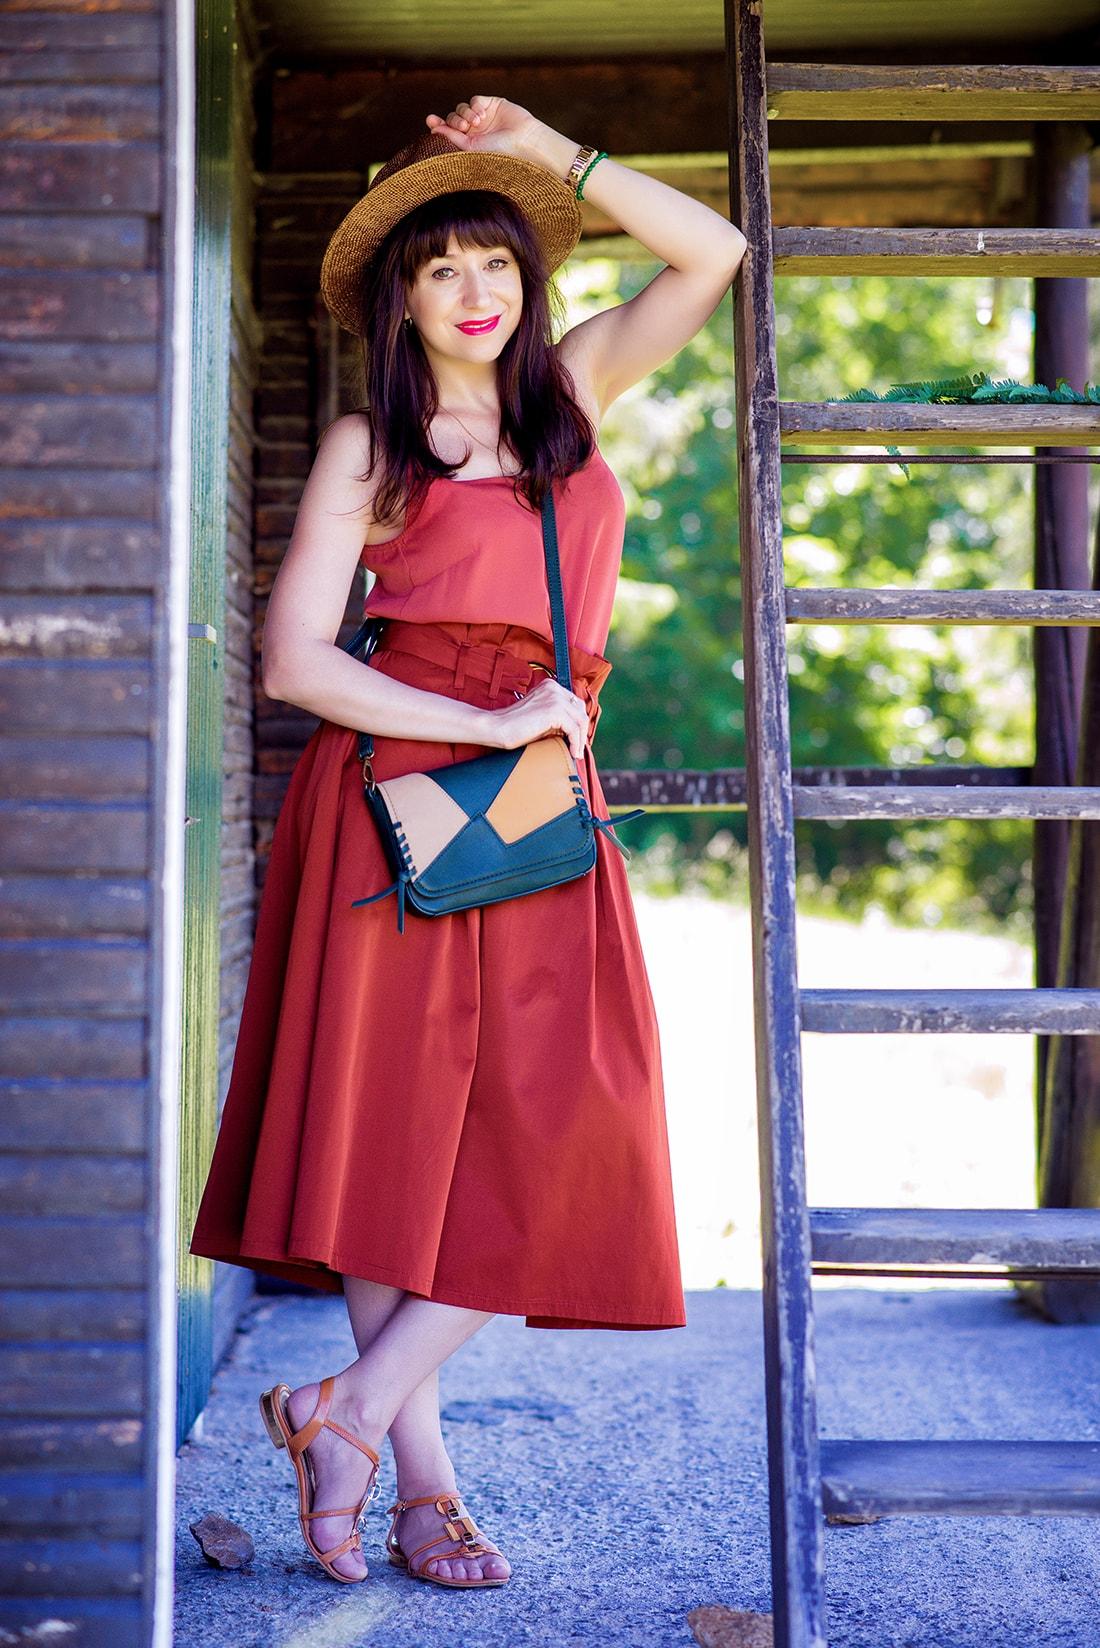 KEĎ KLOBÚK LADÍ S KABELKOU_Katharine-fashion is beautiful_blog 13_Slamený klobúk Parfois_Áčková sukňa Zara_Kabelka Parfois_Katarína Jakubčová_Fashion blogger